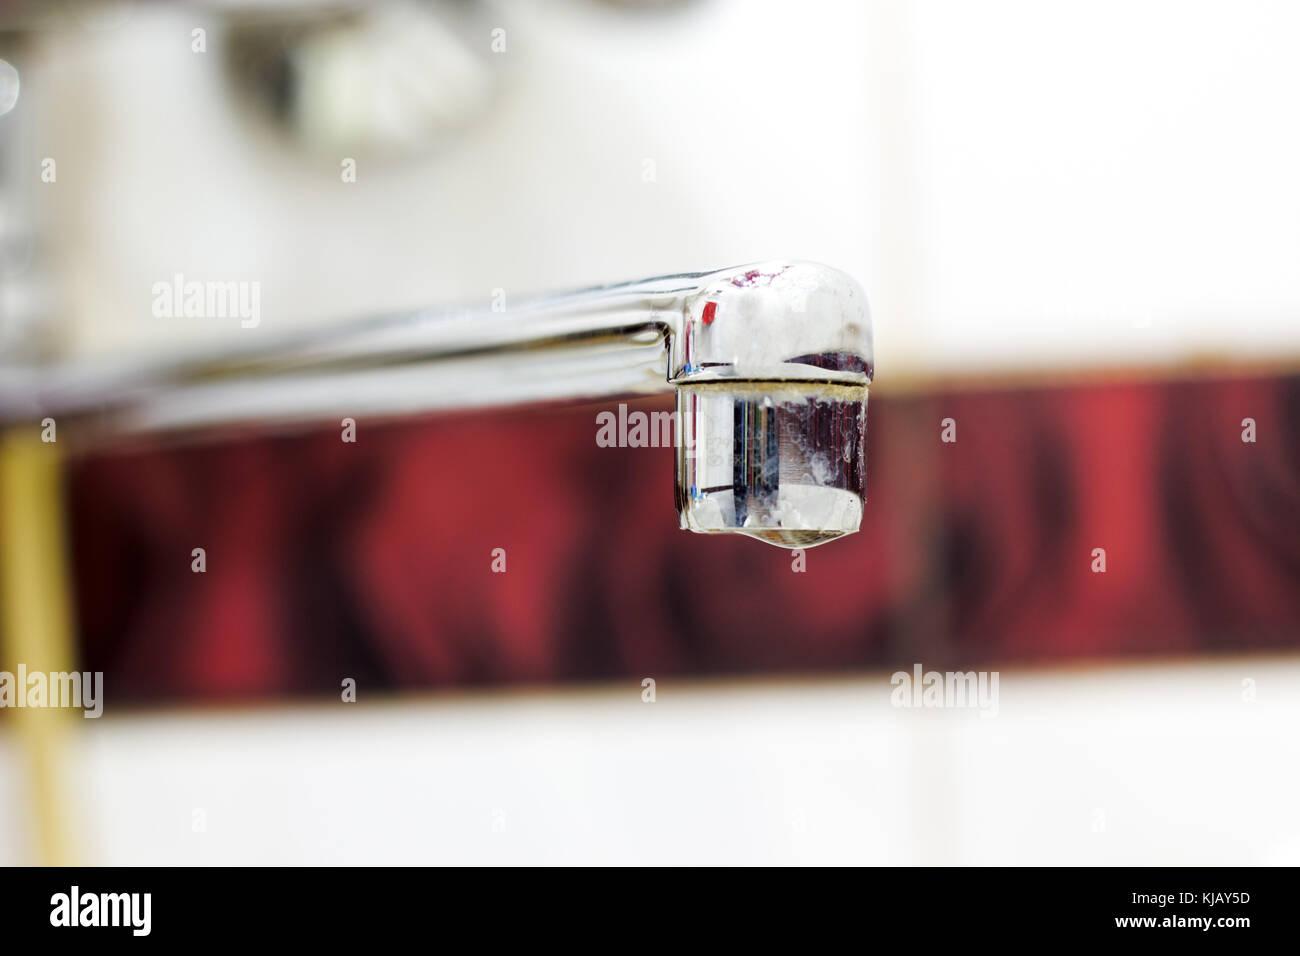 Metal tap and water drop close up - Stock Image